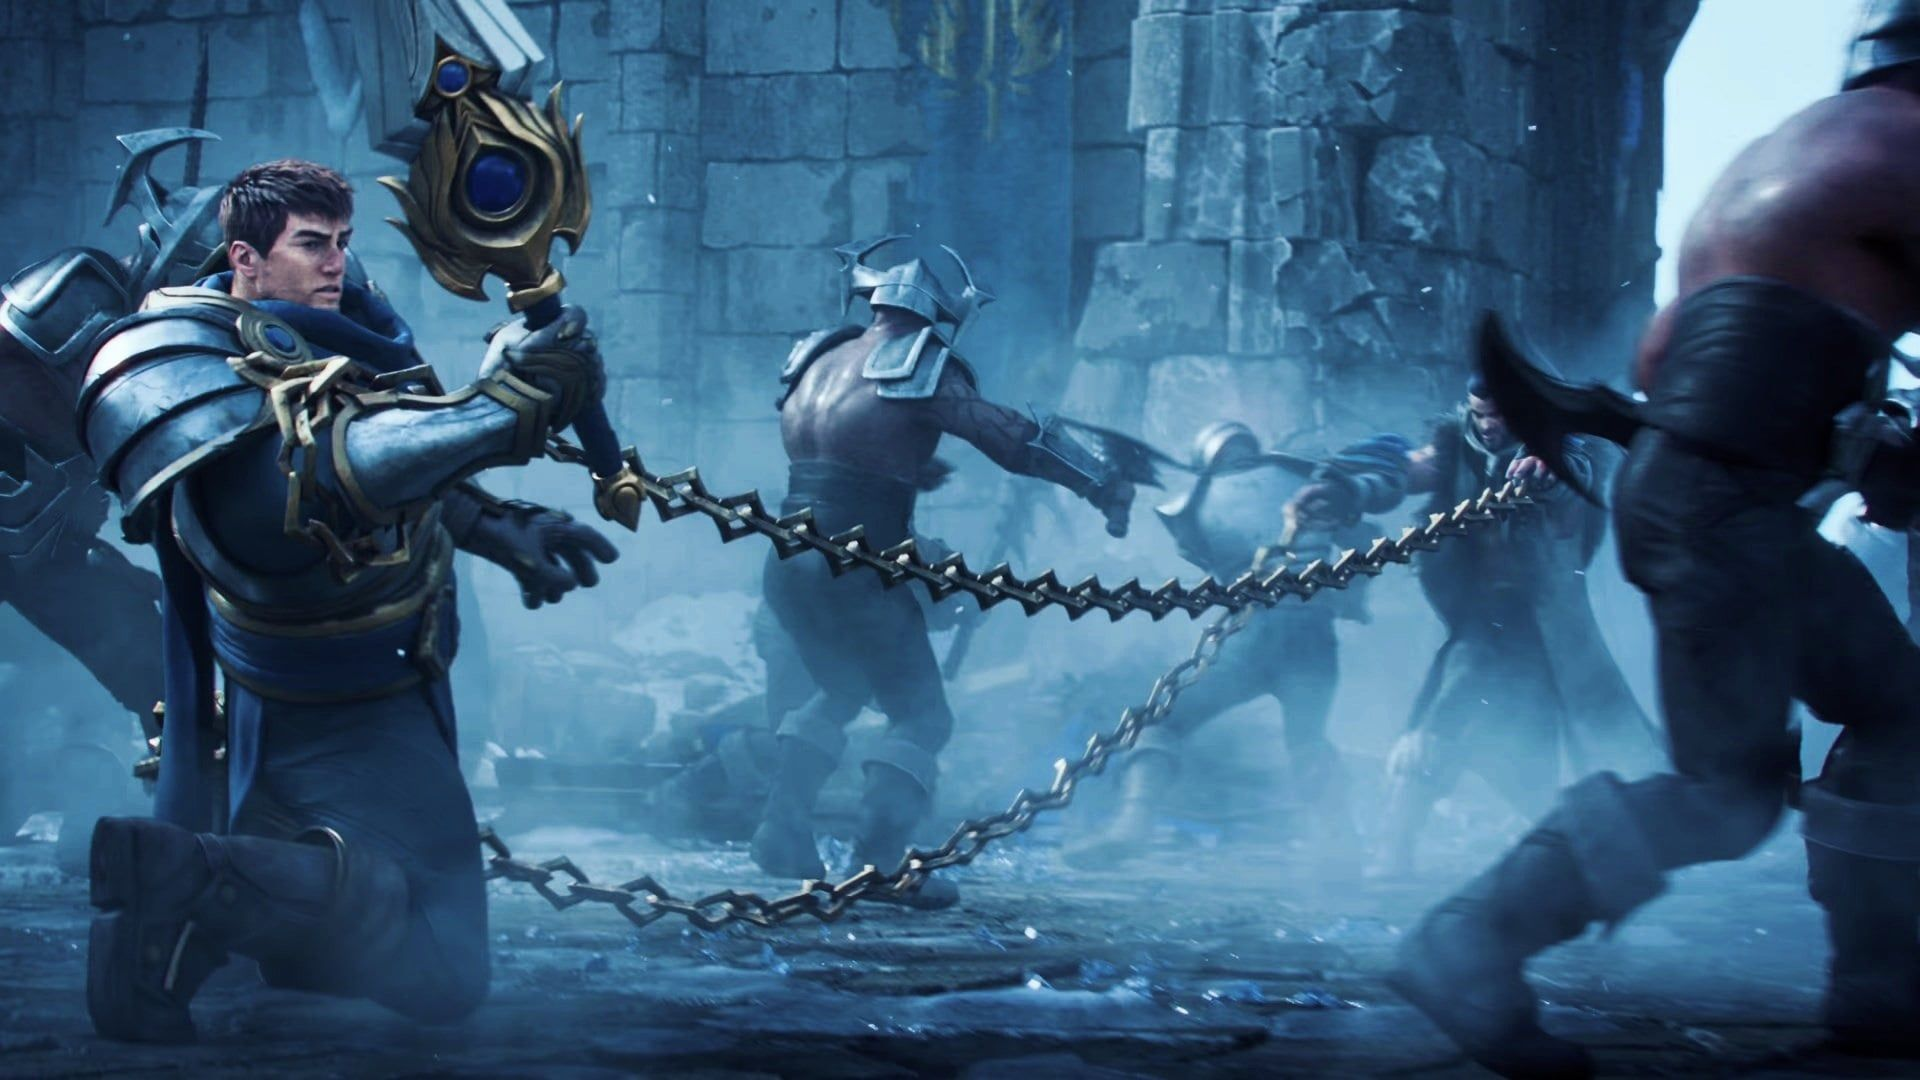 League Of Legends 2020 Warriors Cinematic Wallpapers L2pbomb In 2020 League Of Legends Warriors Wallpaper Legend